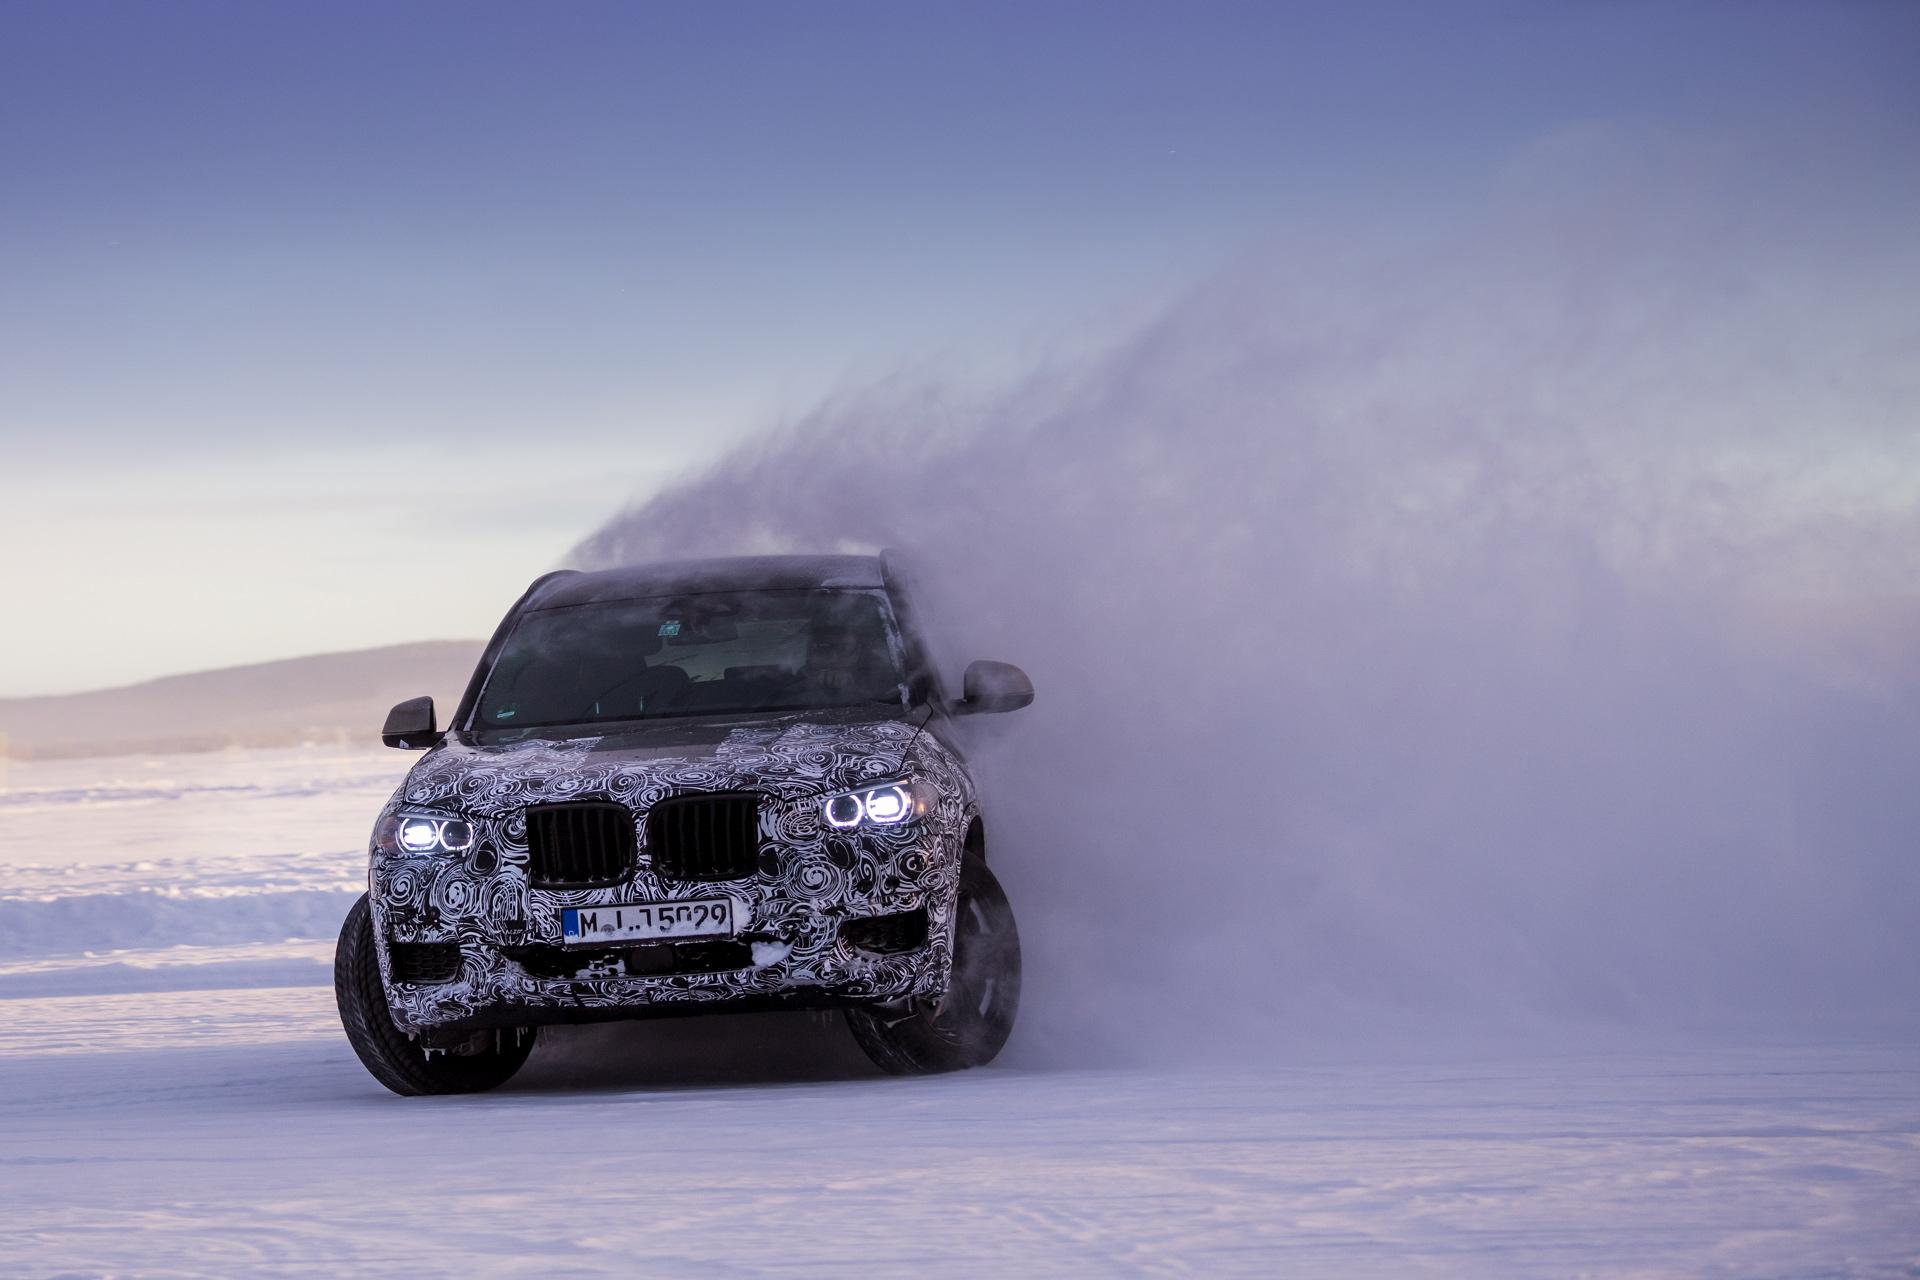 2017 BMW X3 winter testing 09